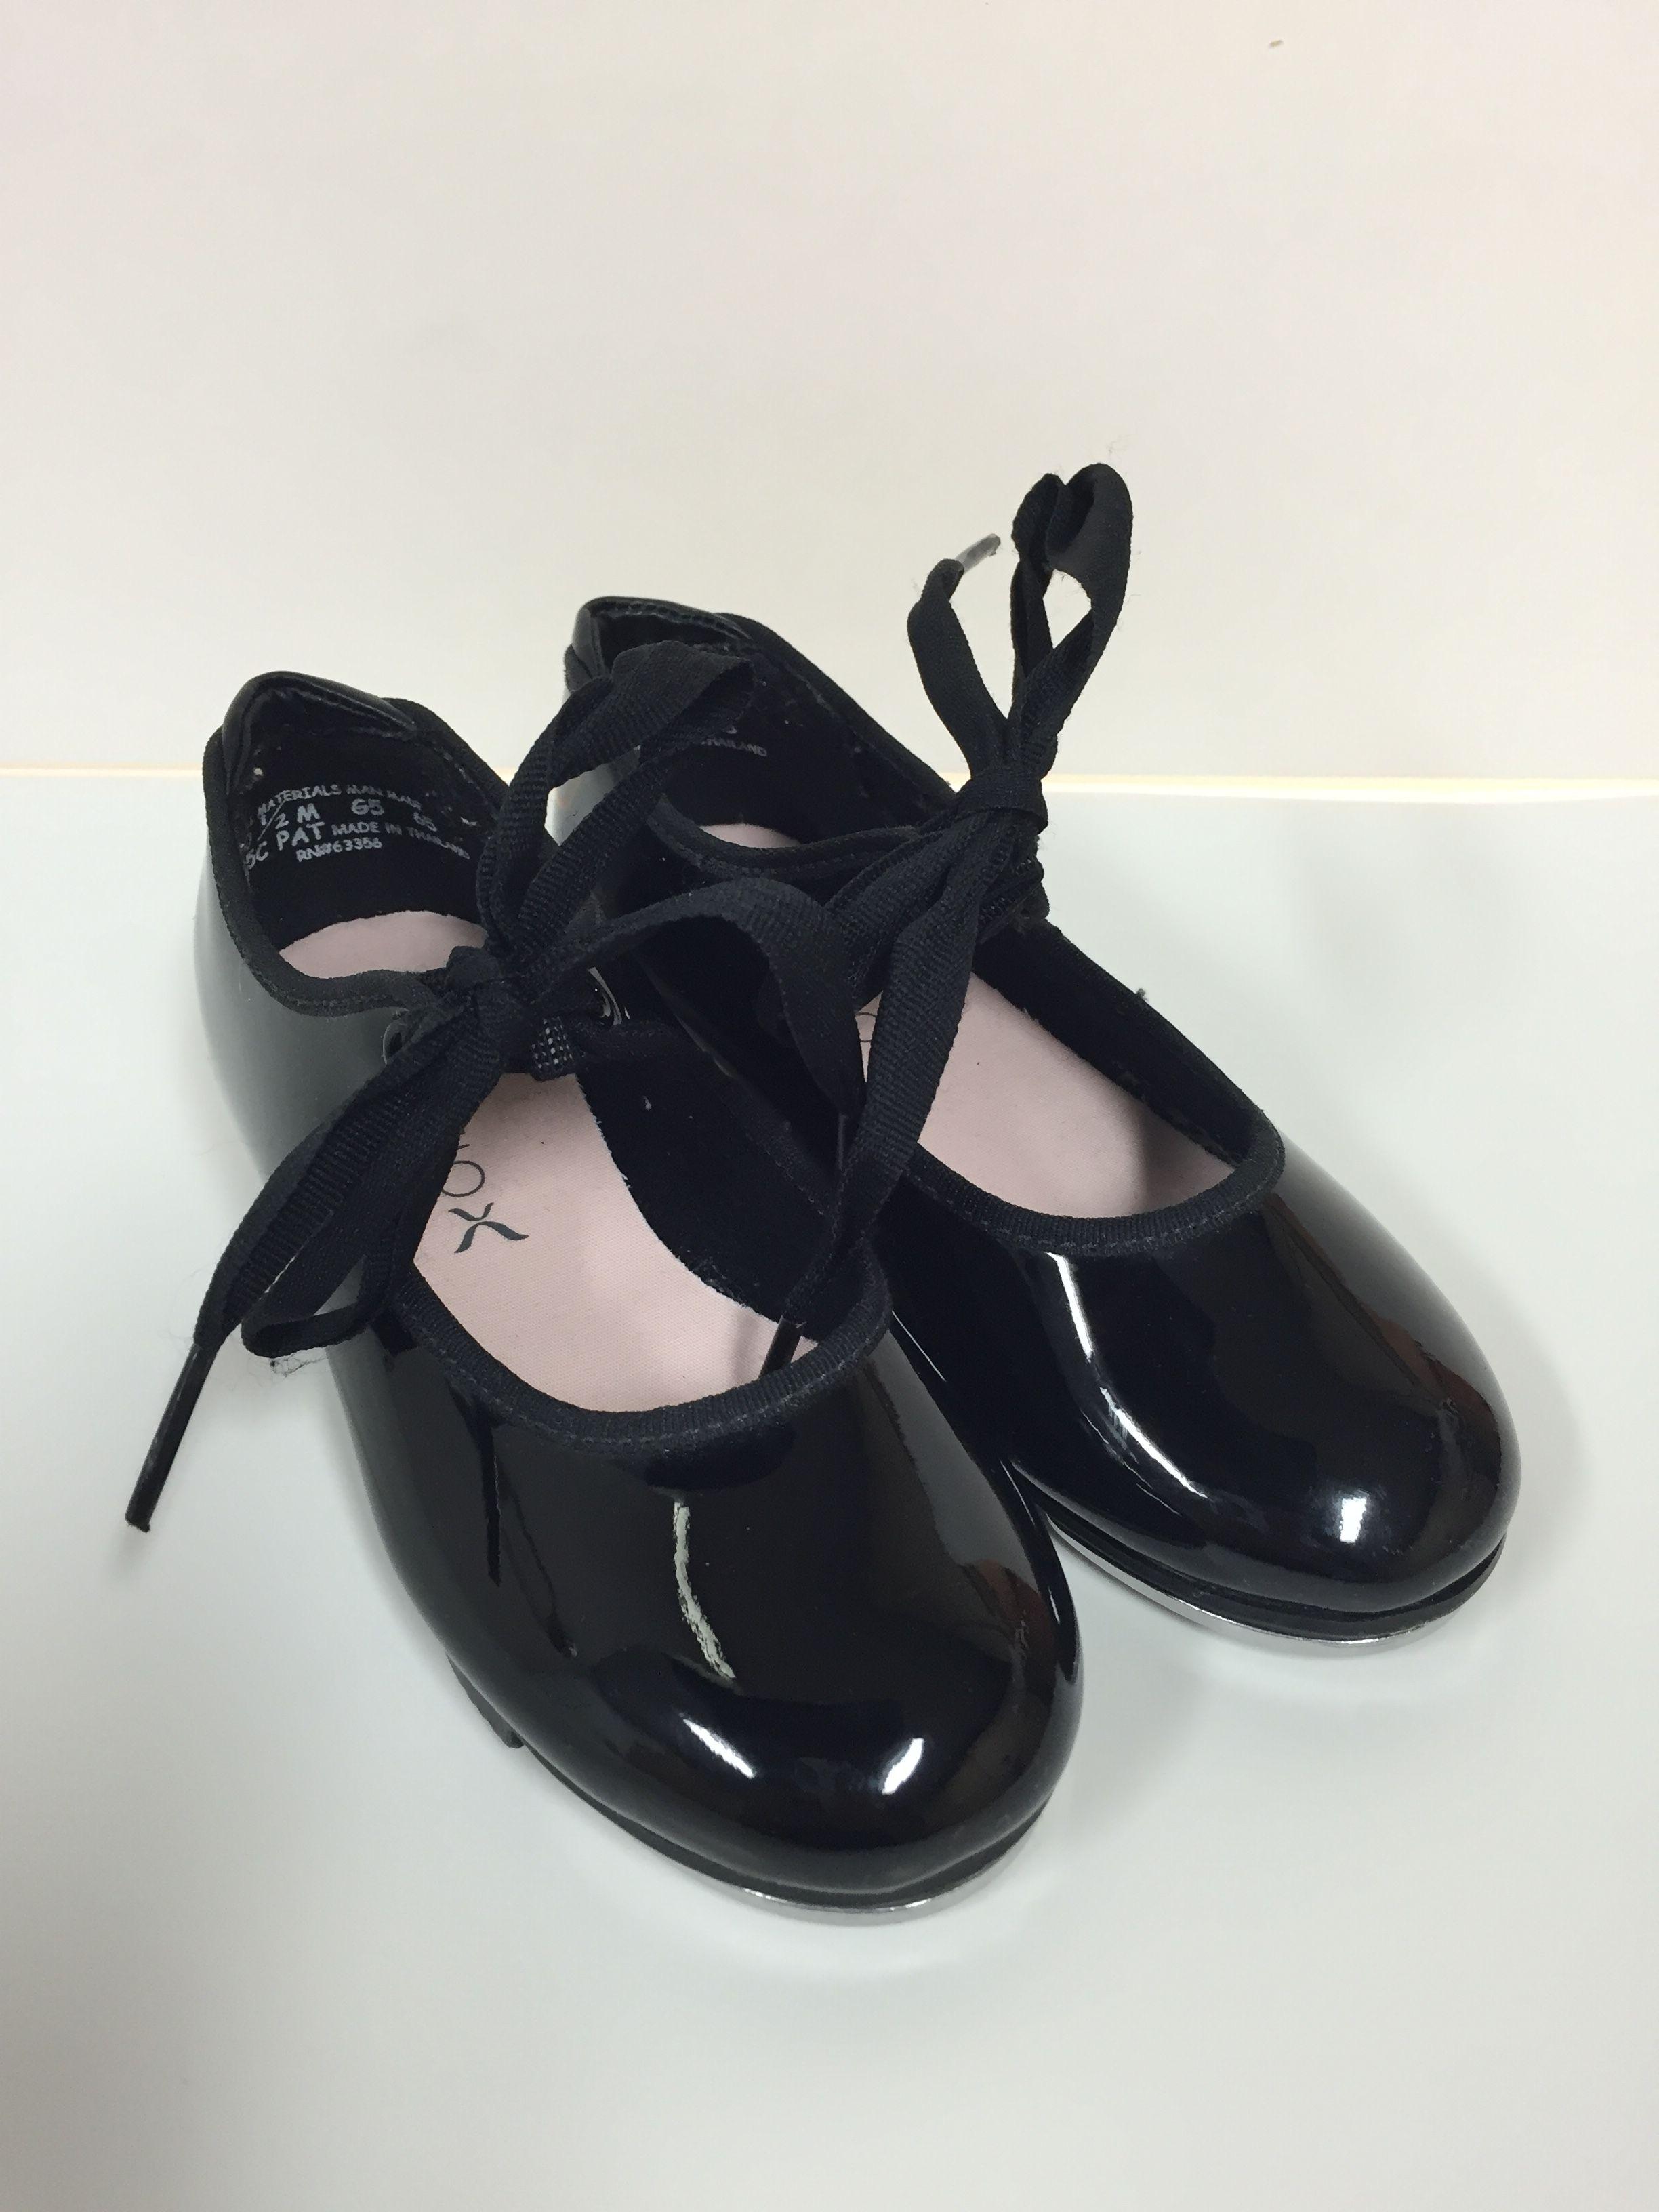 free shipping aliexpress temperament shoes Capezio 10.5 Girls Toddler Kids Black Patent Tap Dance Shoes ...